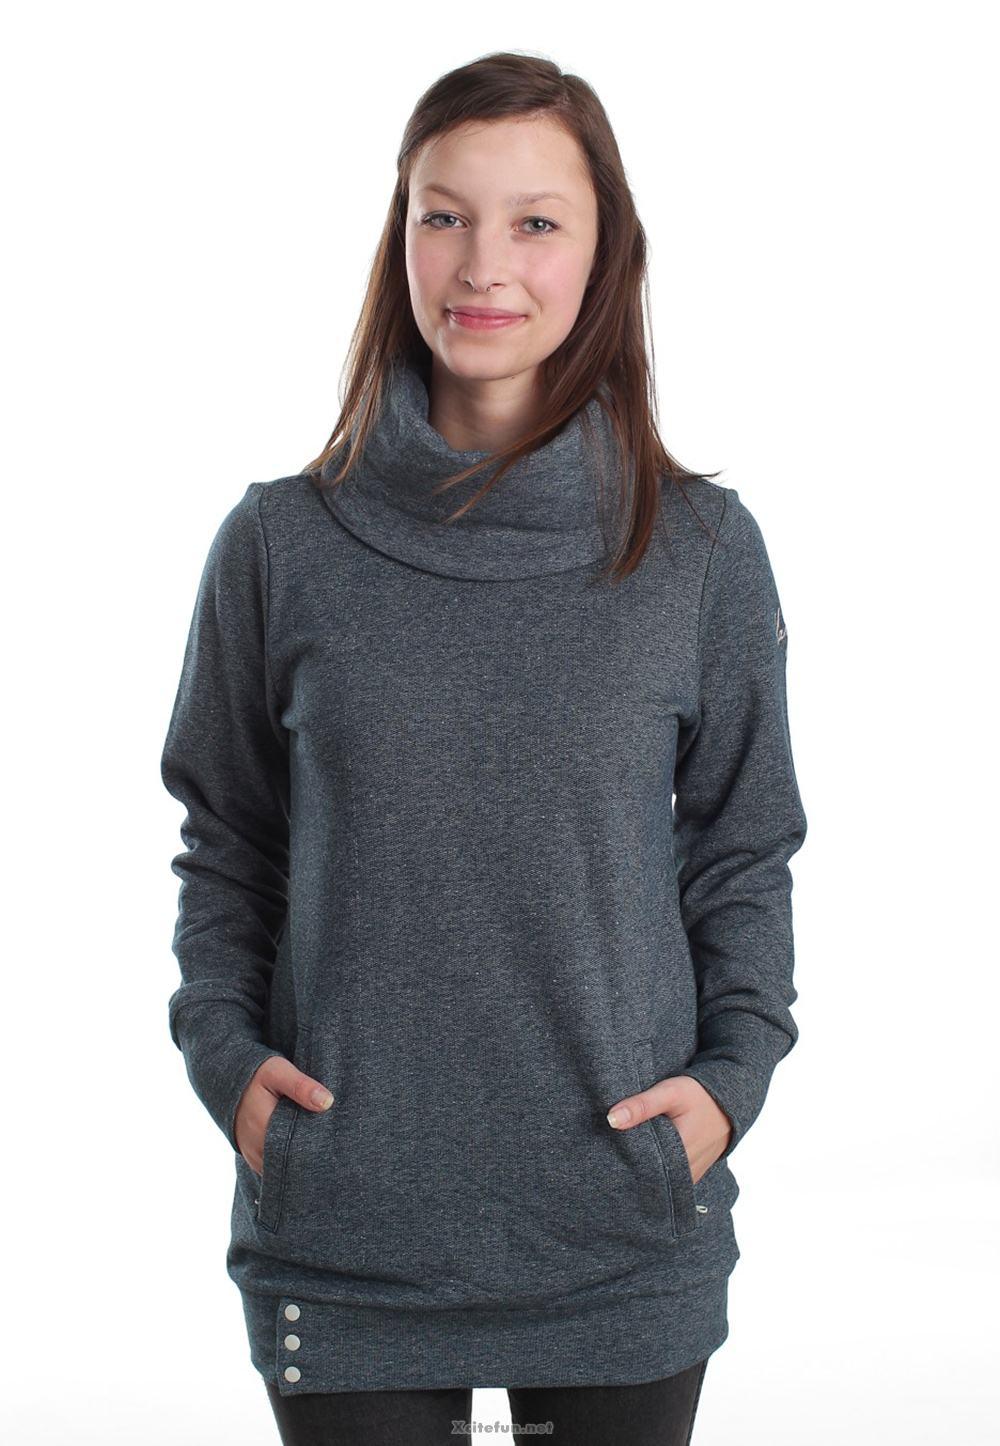 Winter Wool Sweater For Girls Xcitefun Net